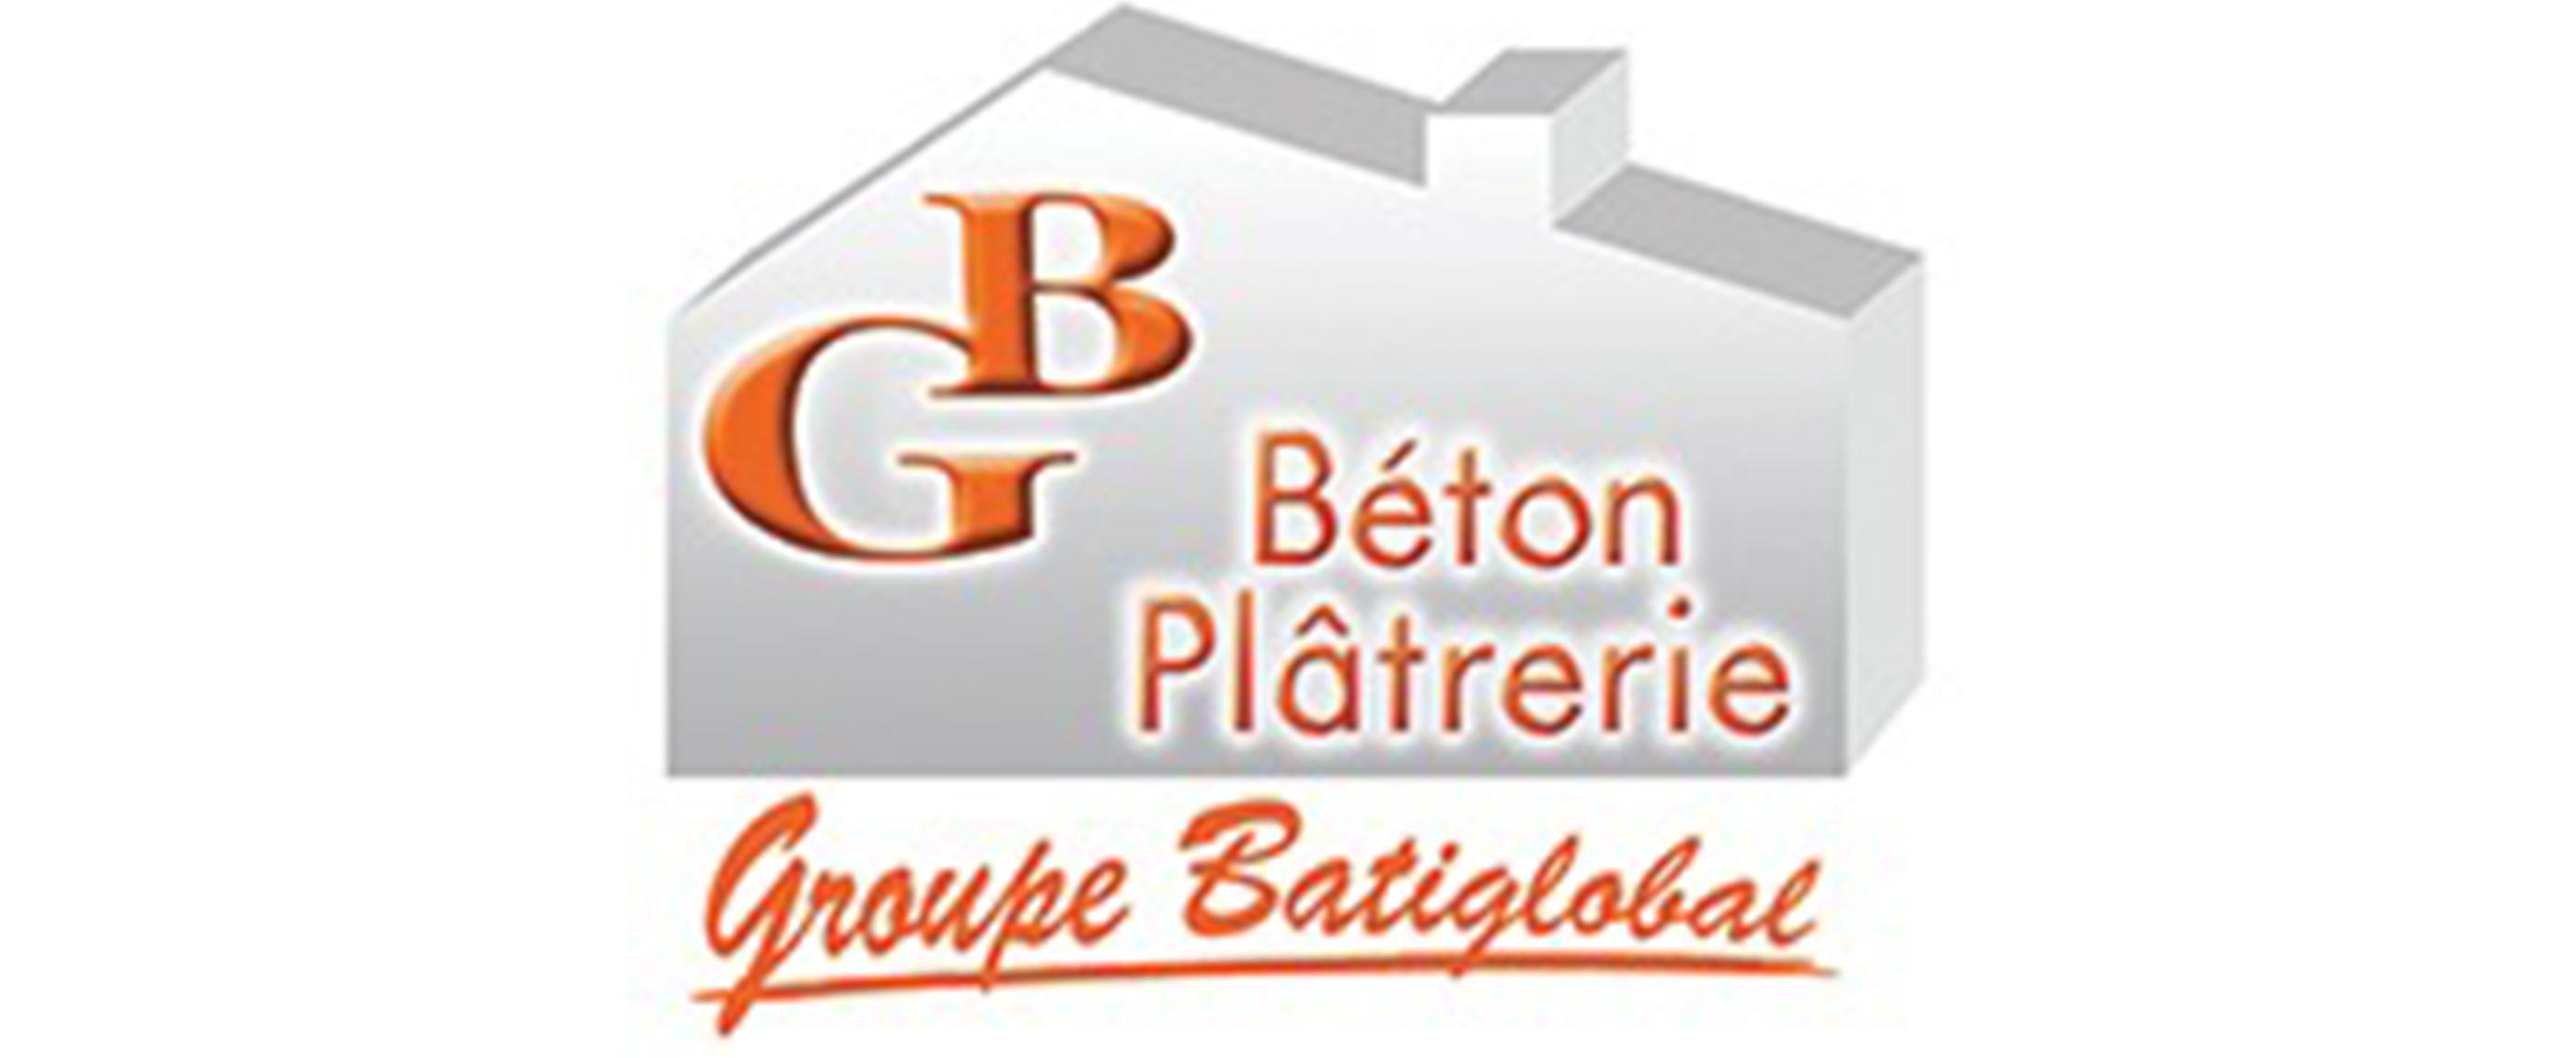 BG Béton Plâtrerie à Bernolsheim